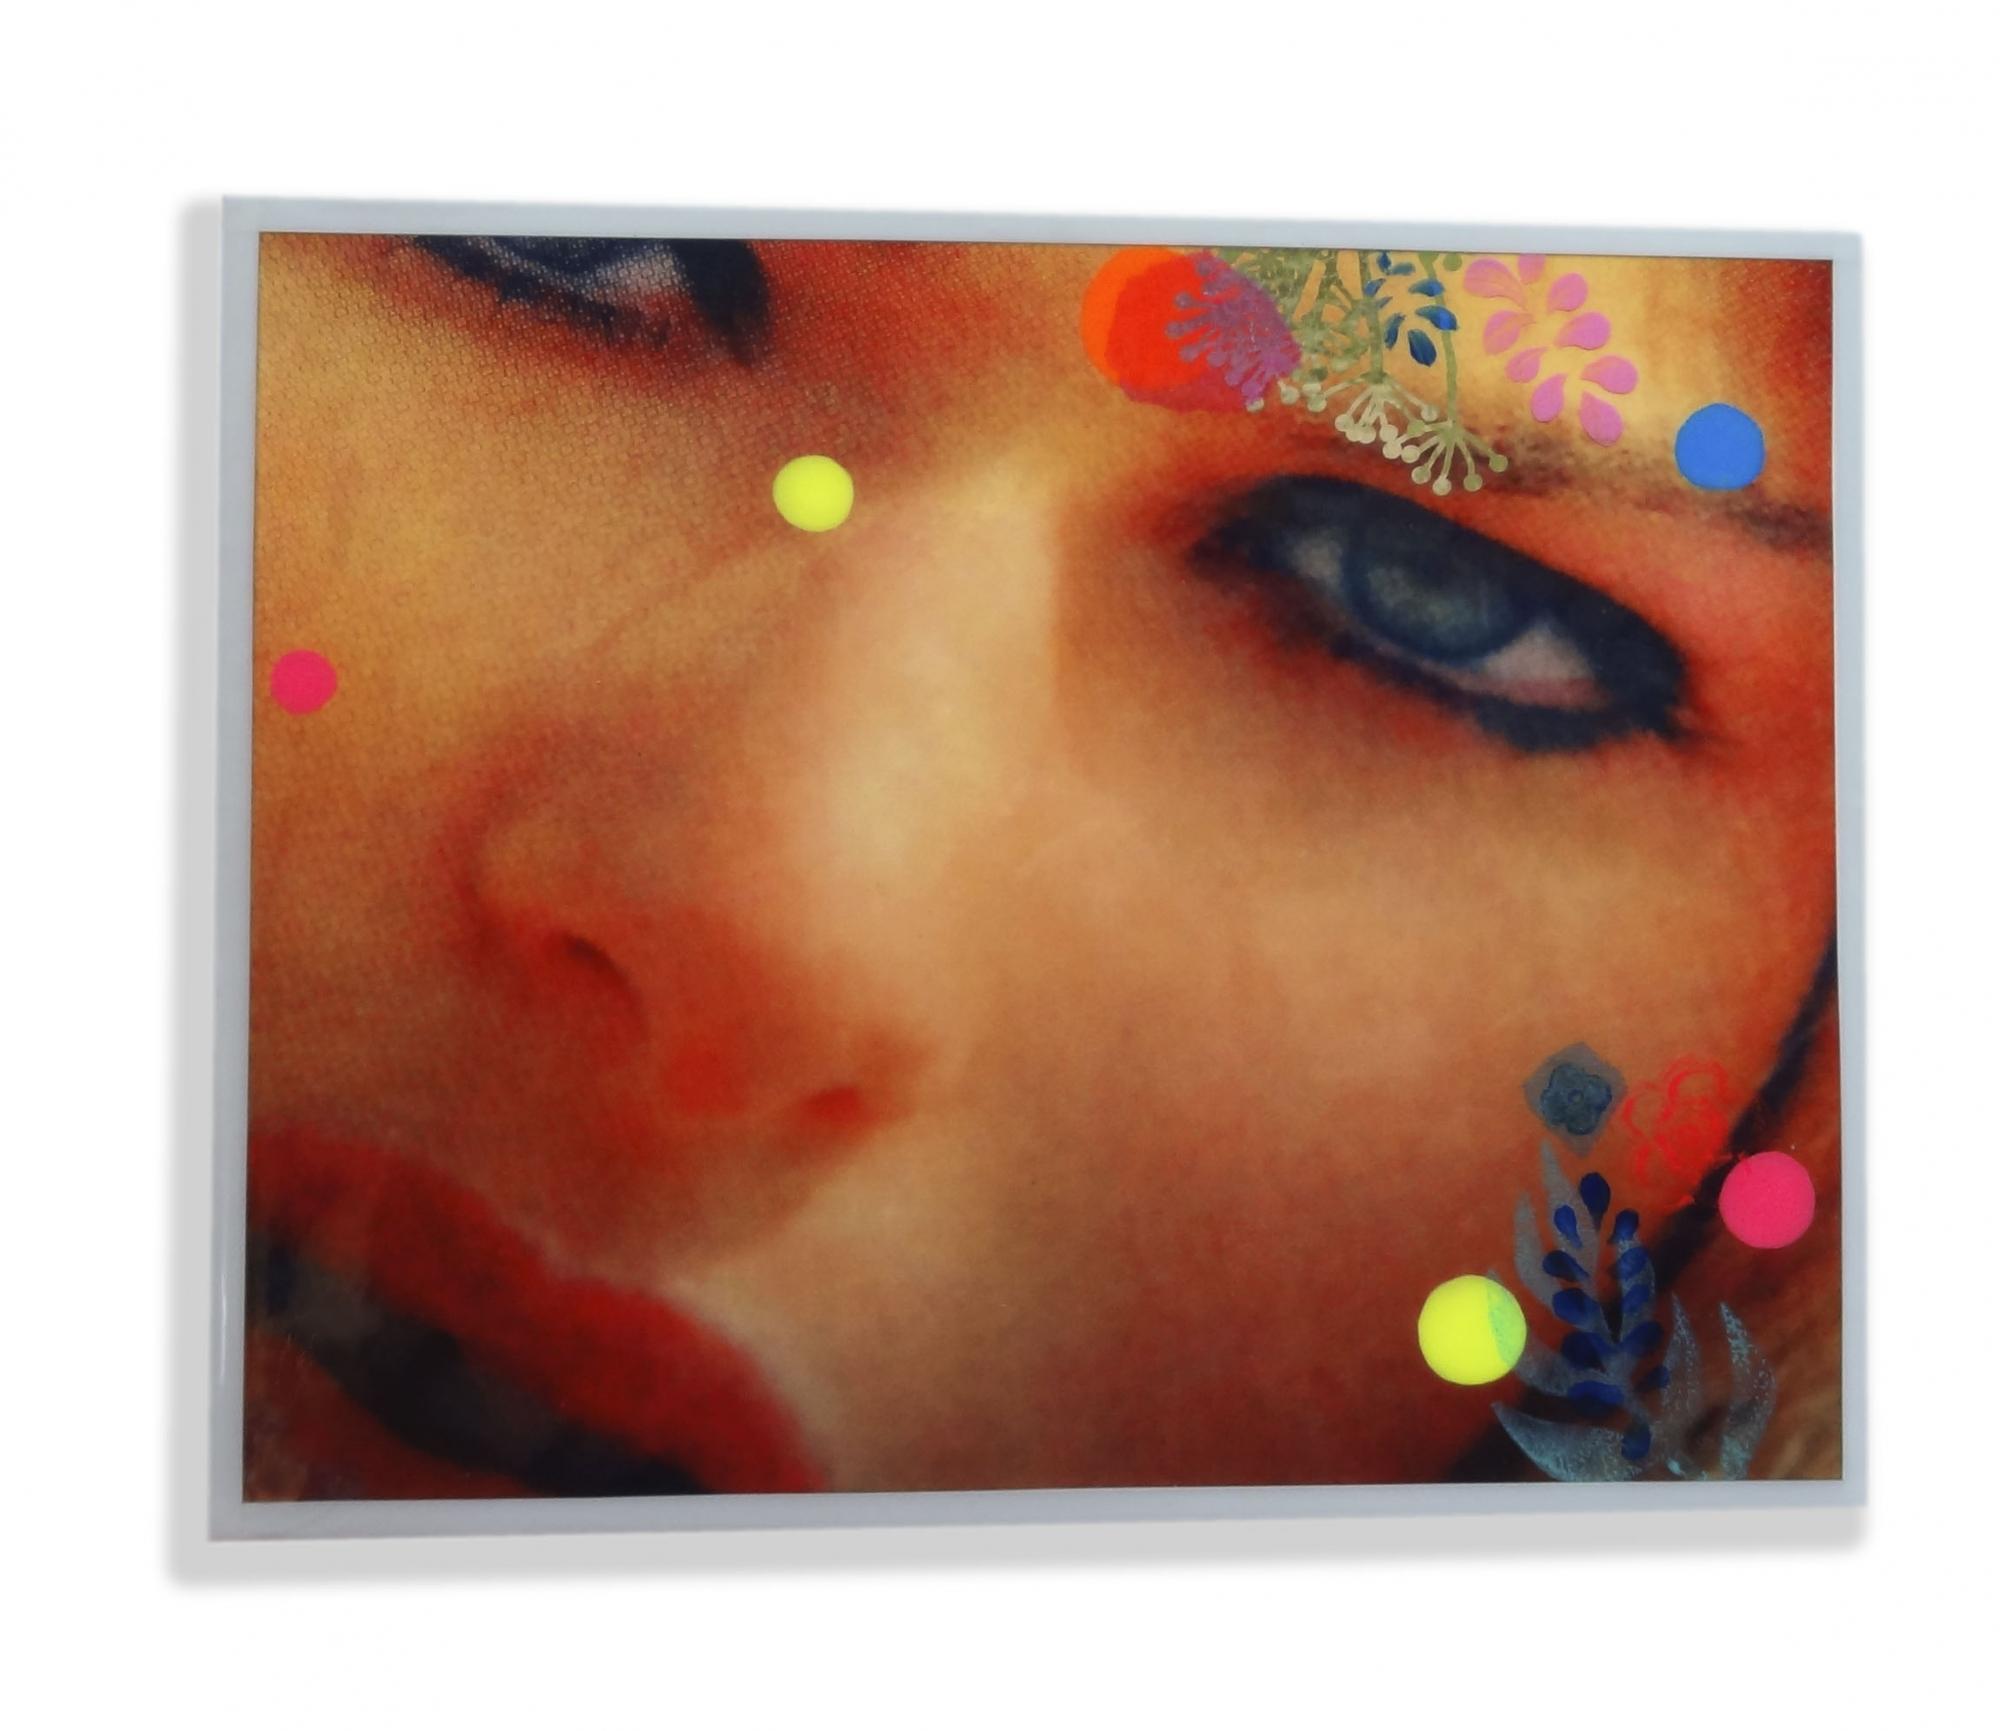 Gaze Study d by Helene Lacelle